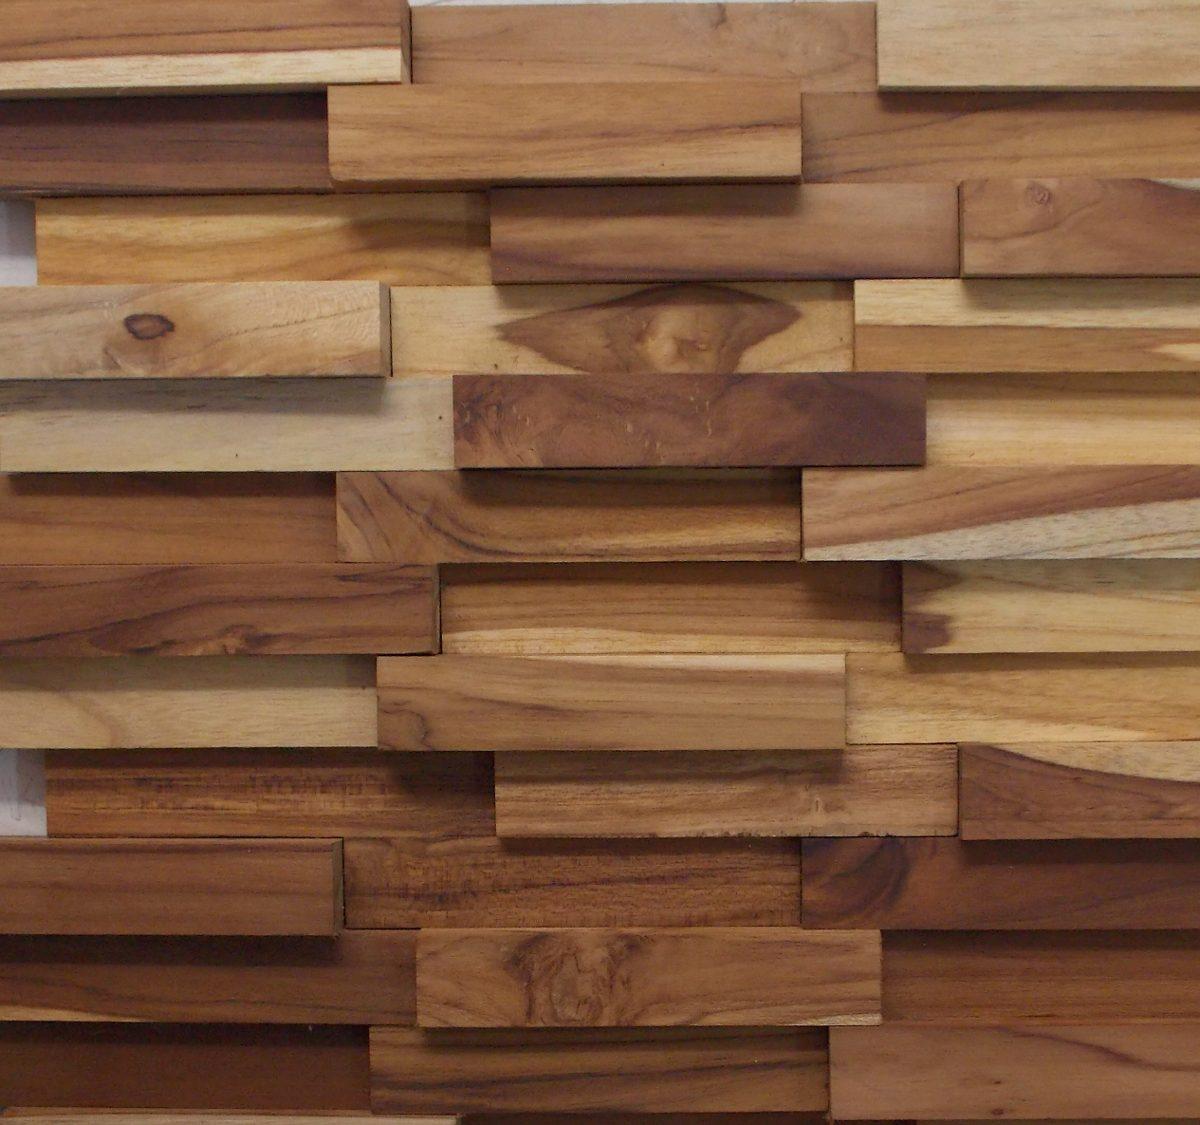 Mosaico Madeira Filete Teca Lisa Pastilhas 30cm X 30cm R$ 22 90  #42271B 1200x1125